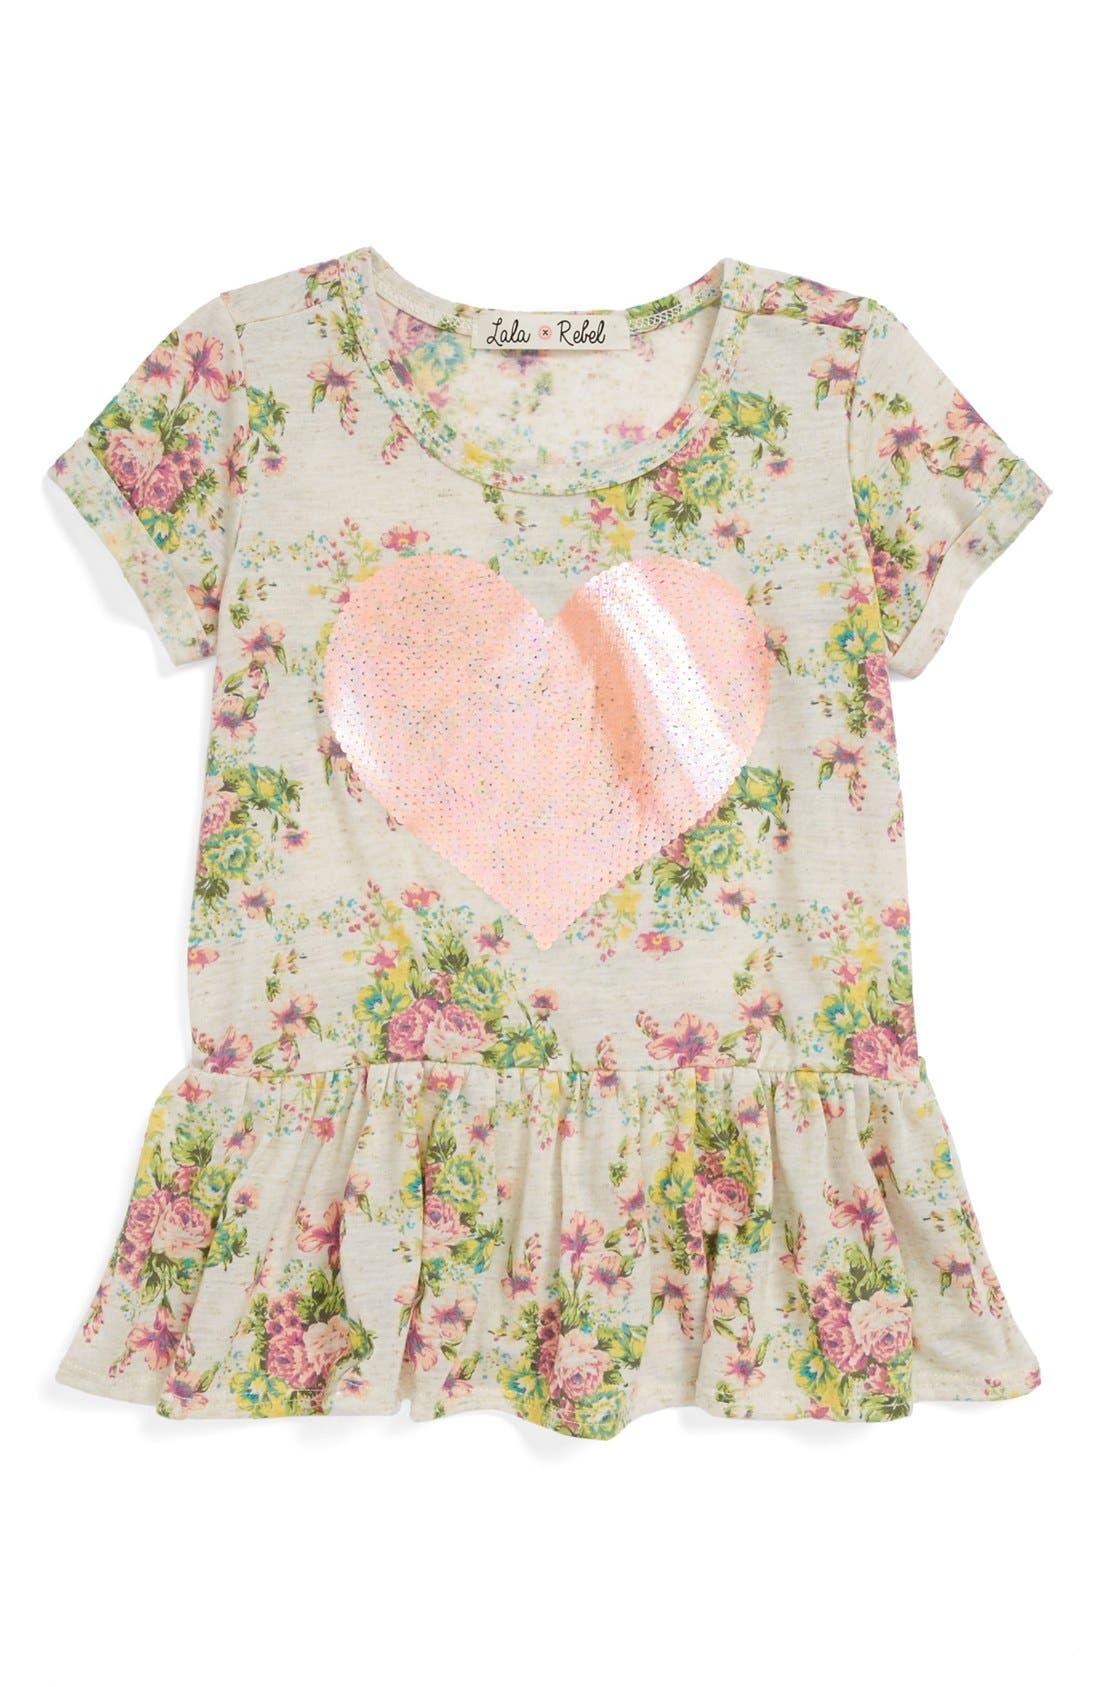 Alternate Image 1 Selected - Lala Rebel Sequin Print Peplum Top (Toddler Girls)